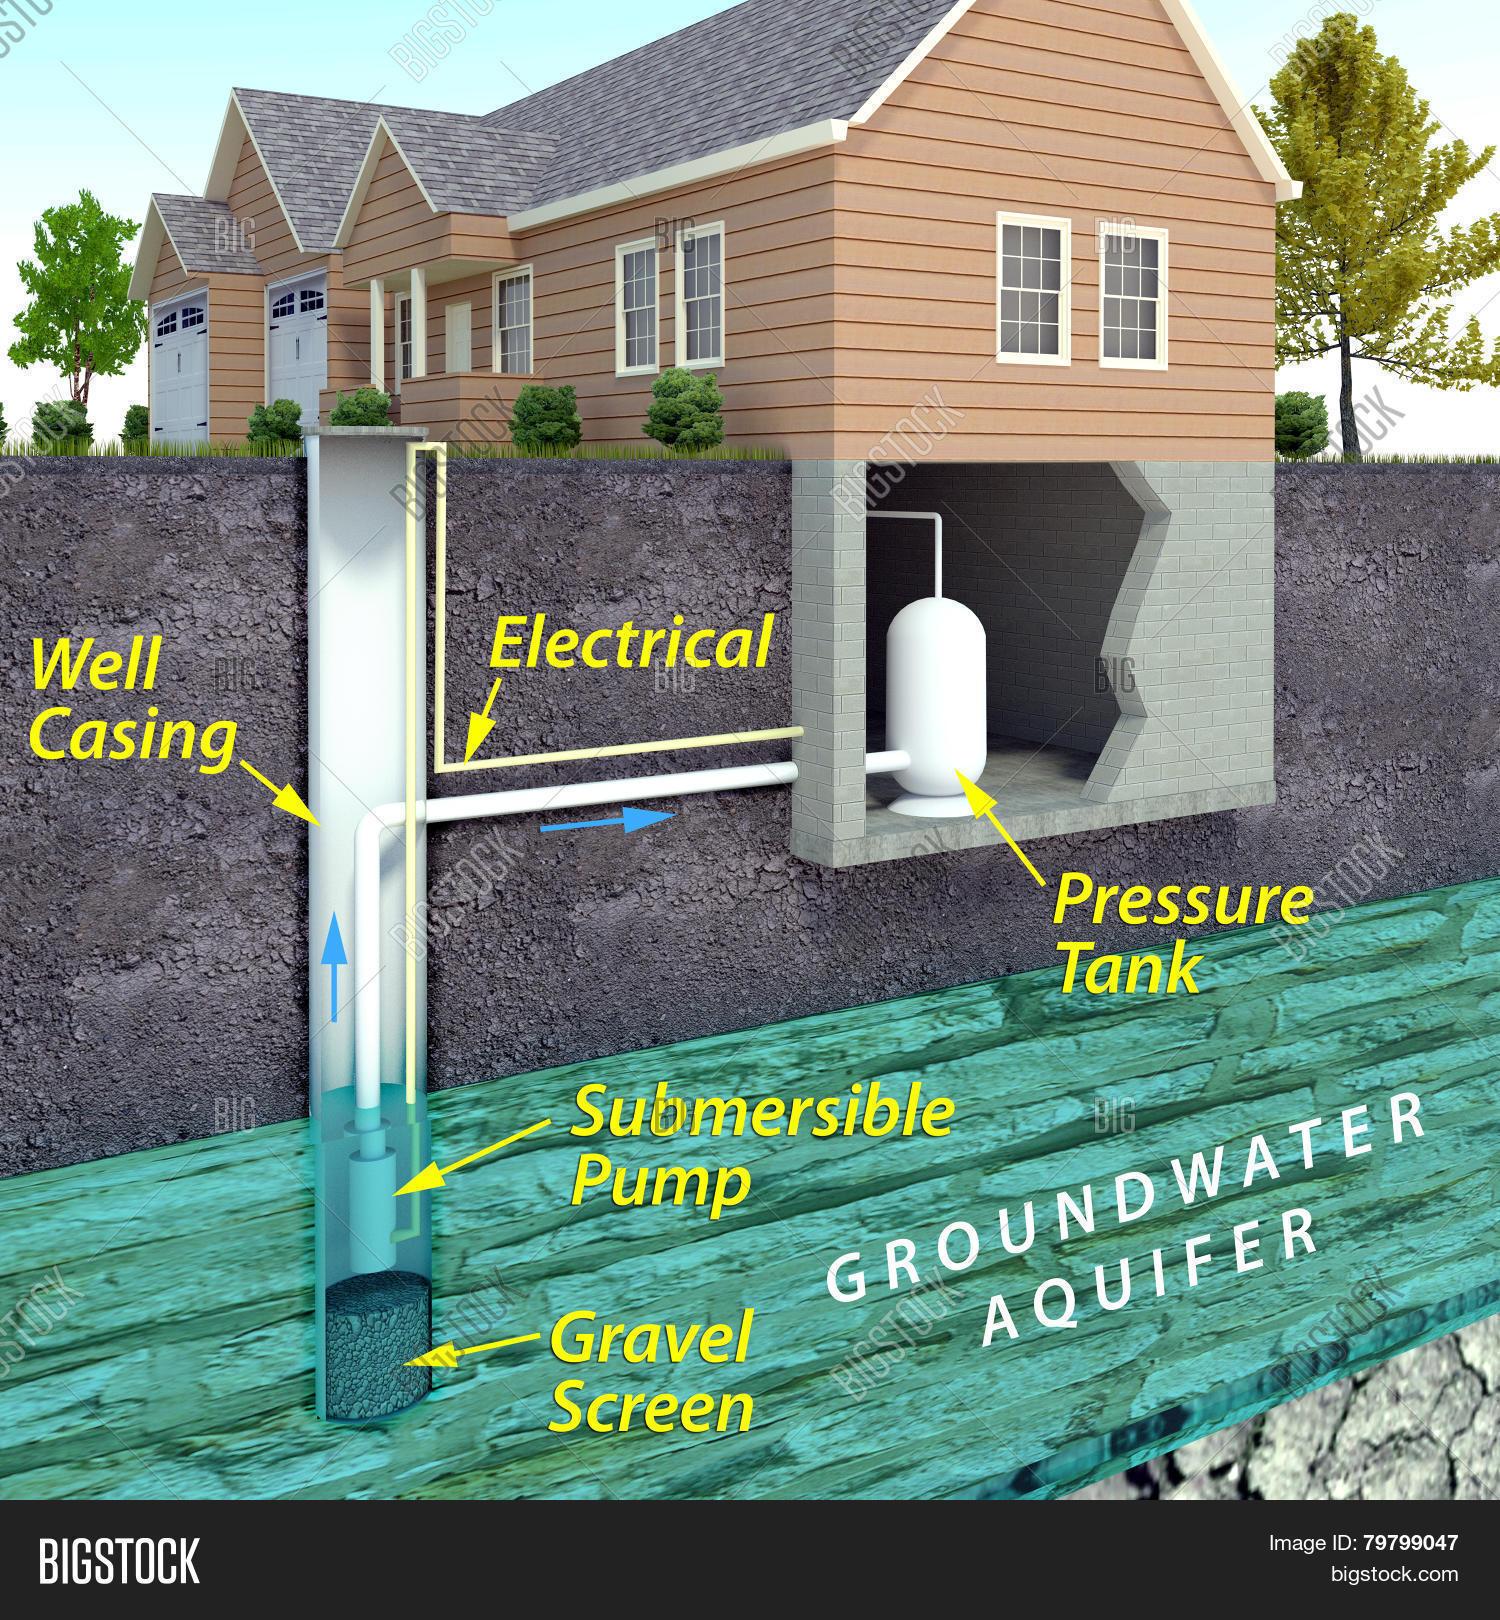 Modern Water Well Image Photo Free Trial Bigstock Tank Schematics Diagram